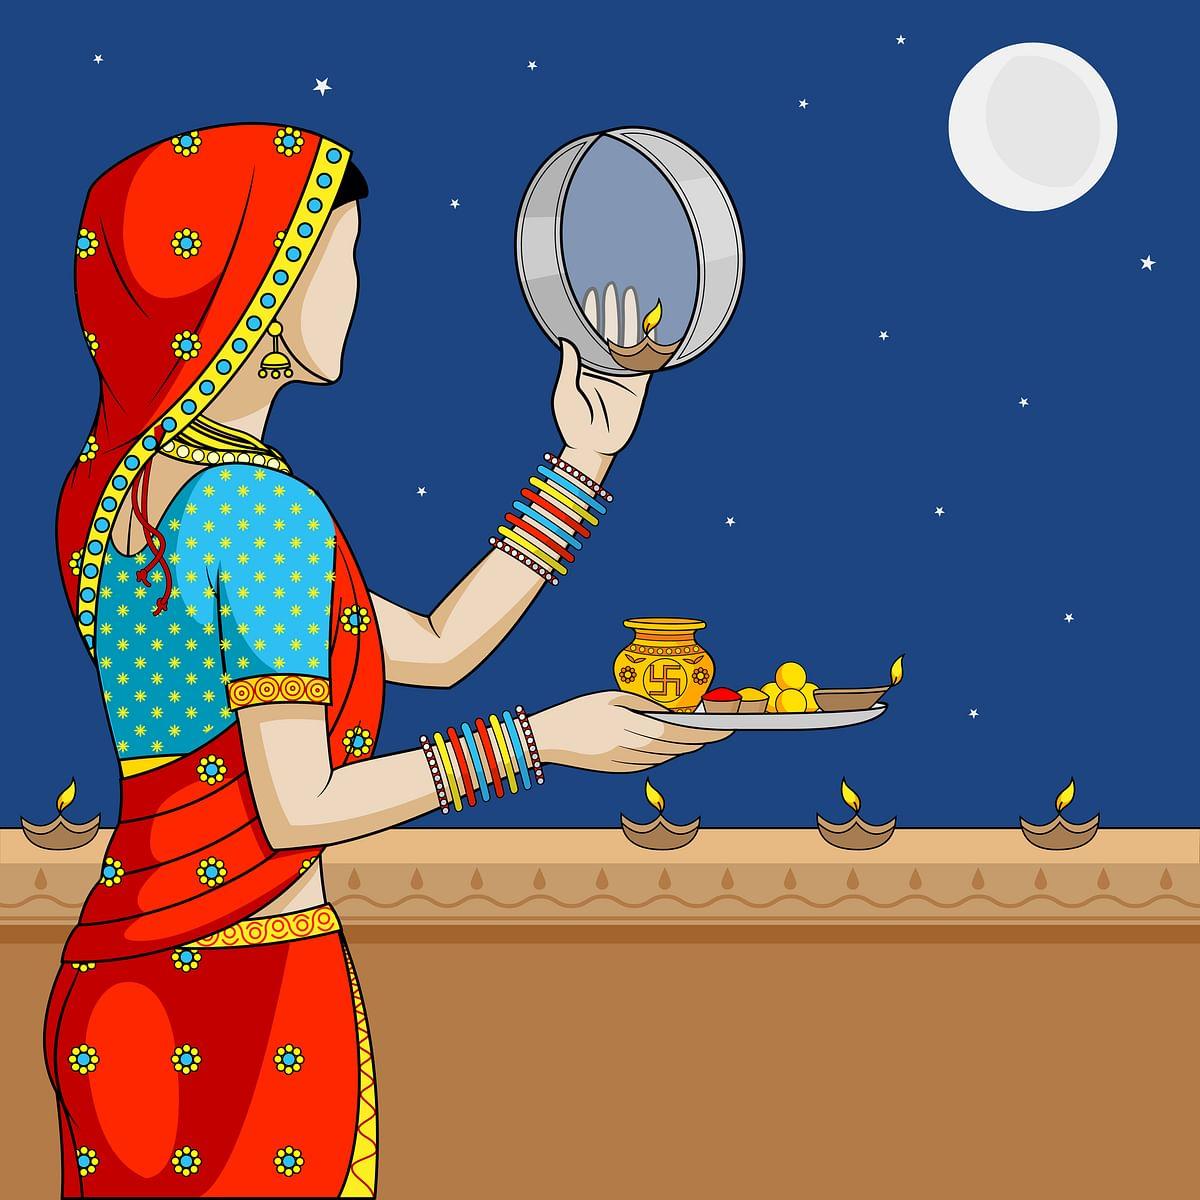 करवा चौथ व्रत विधि- Karwa Chauth Pooja Vrat Vidhi in Hindi